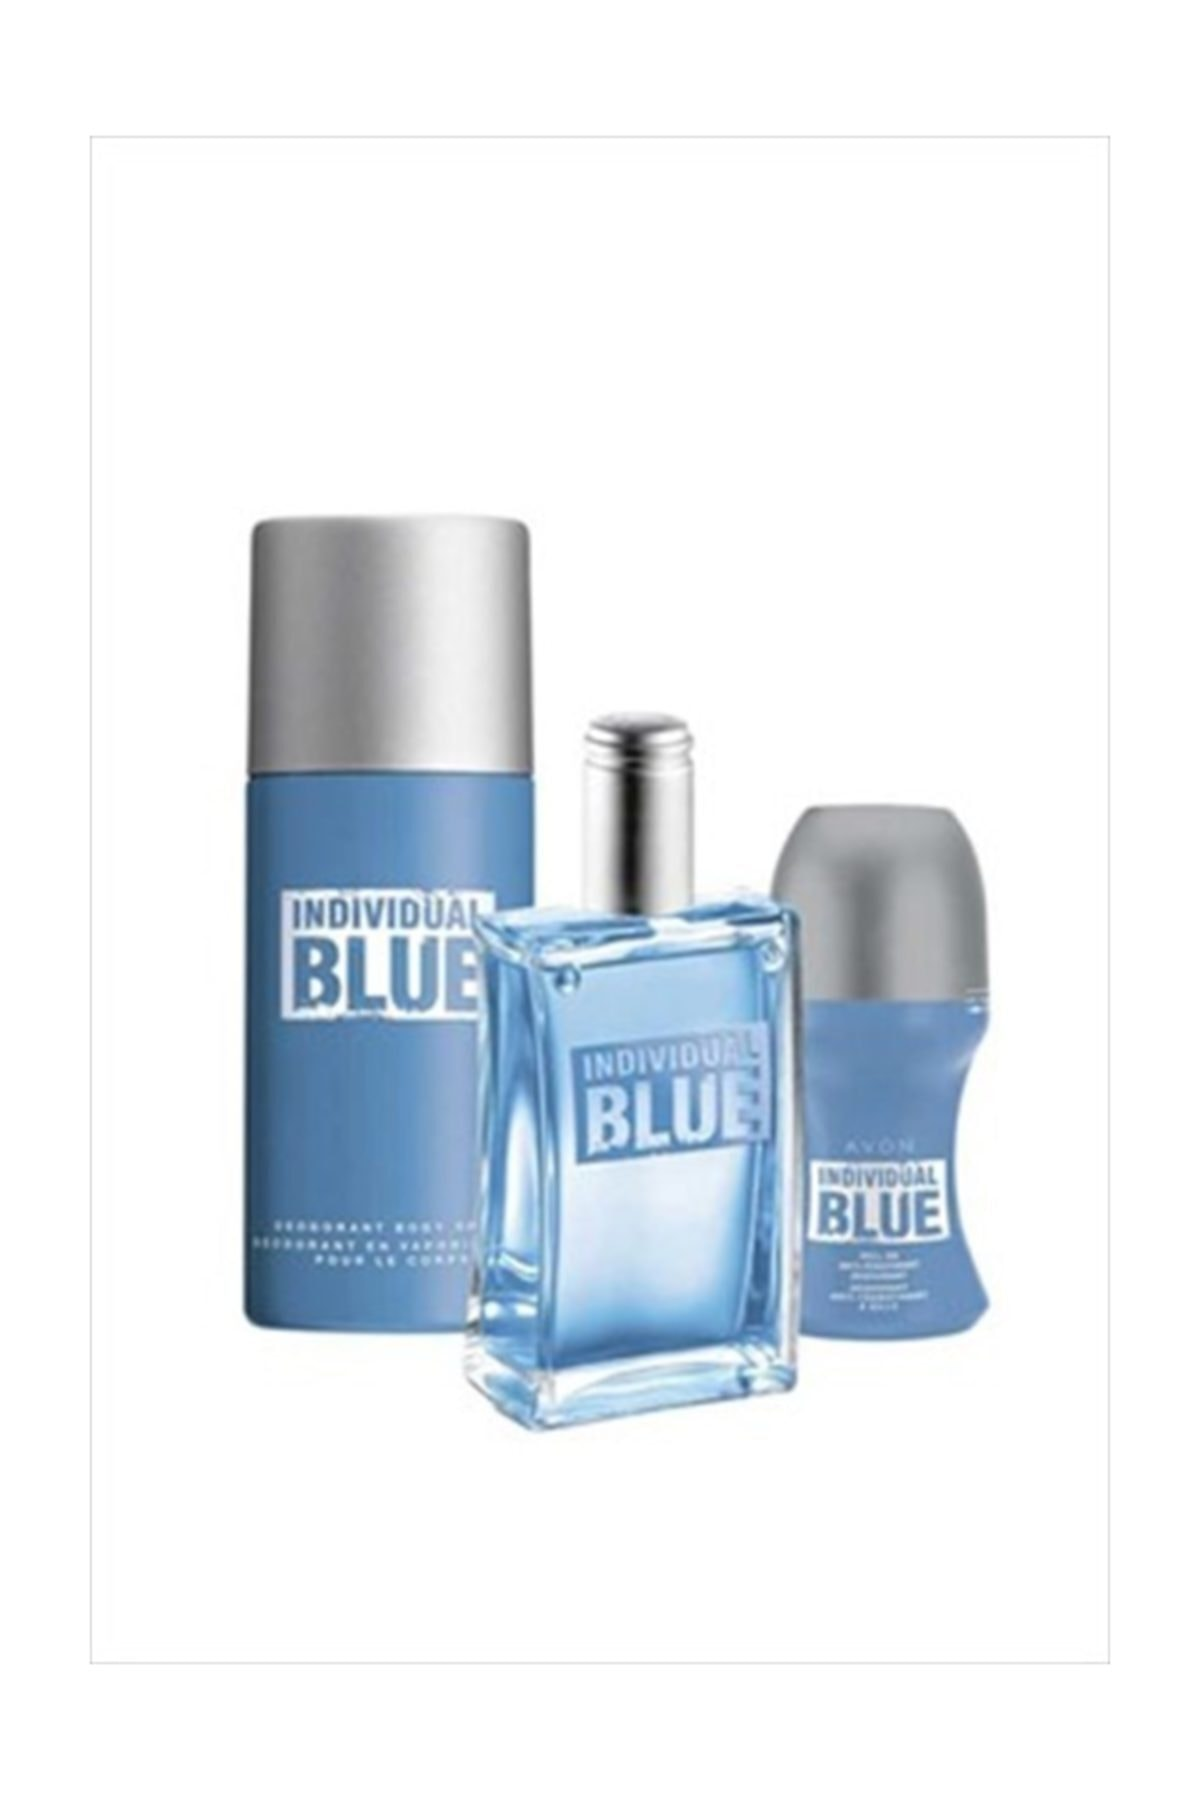 Individual Blue Edt Erkek Parfüm Seti 8681298980902 200 ml